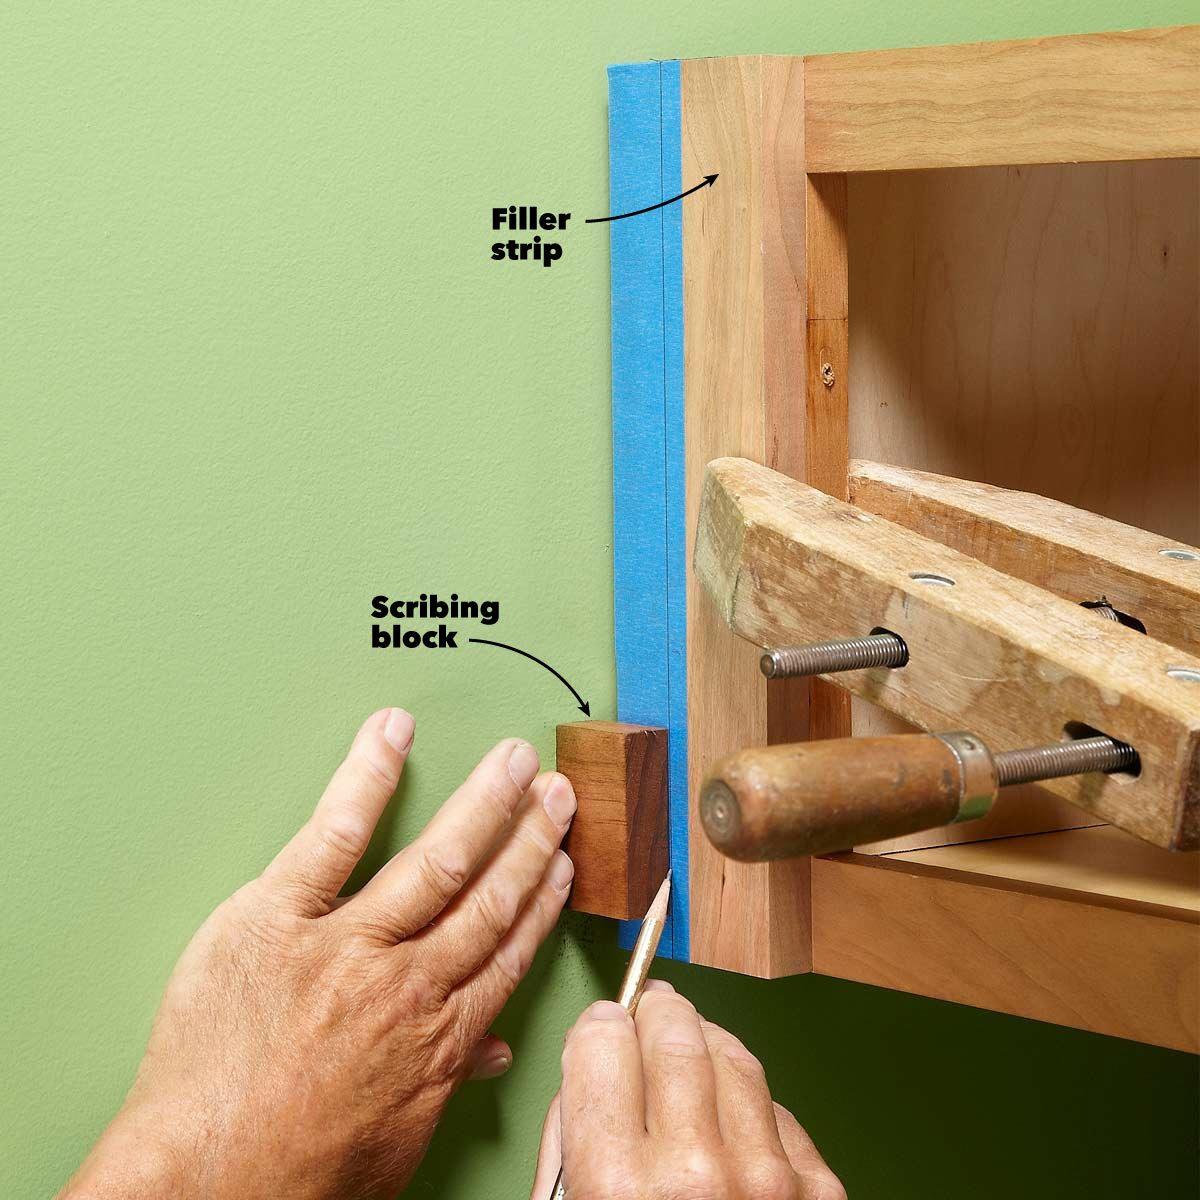 wood block for scribing